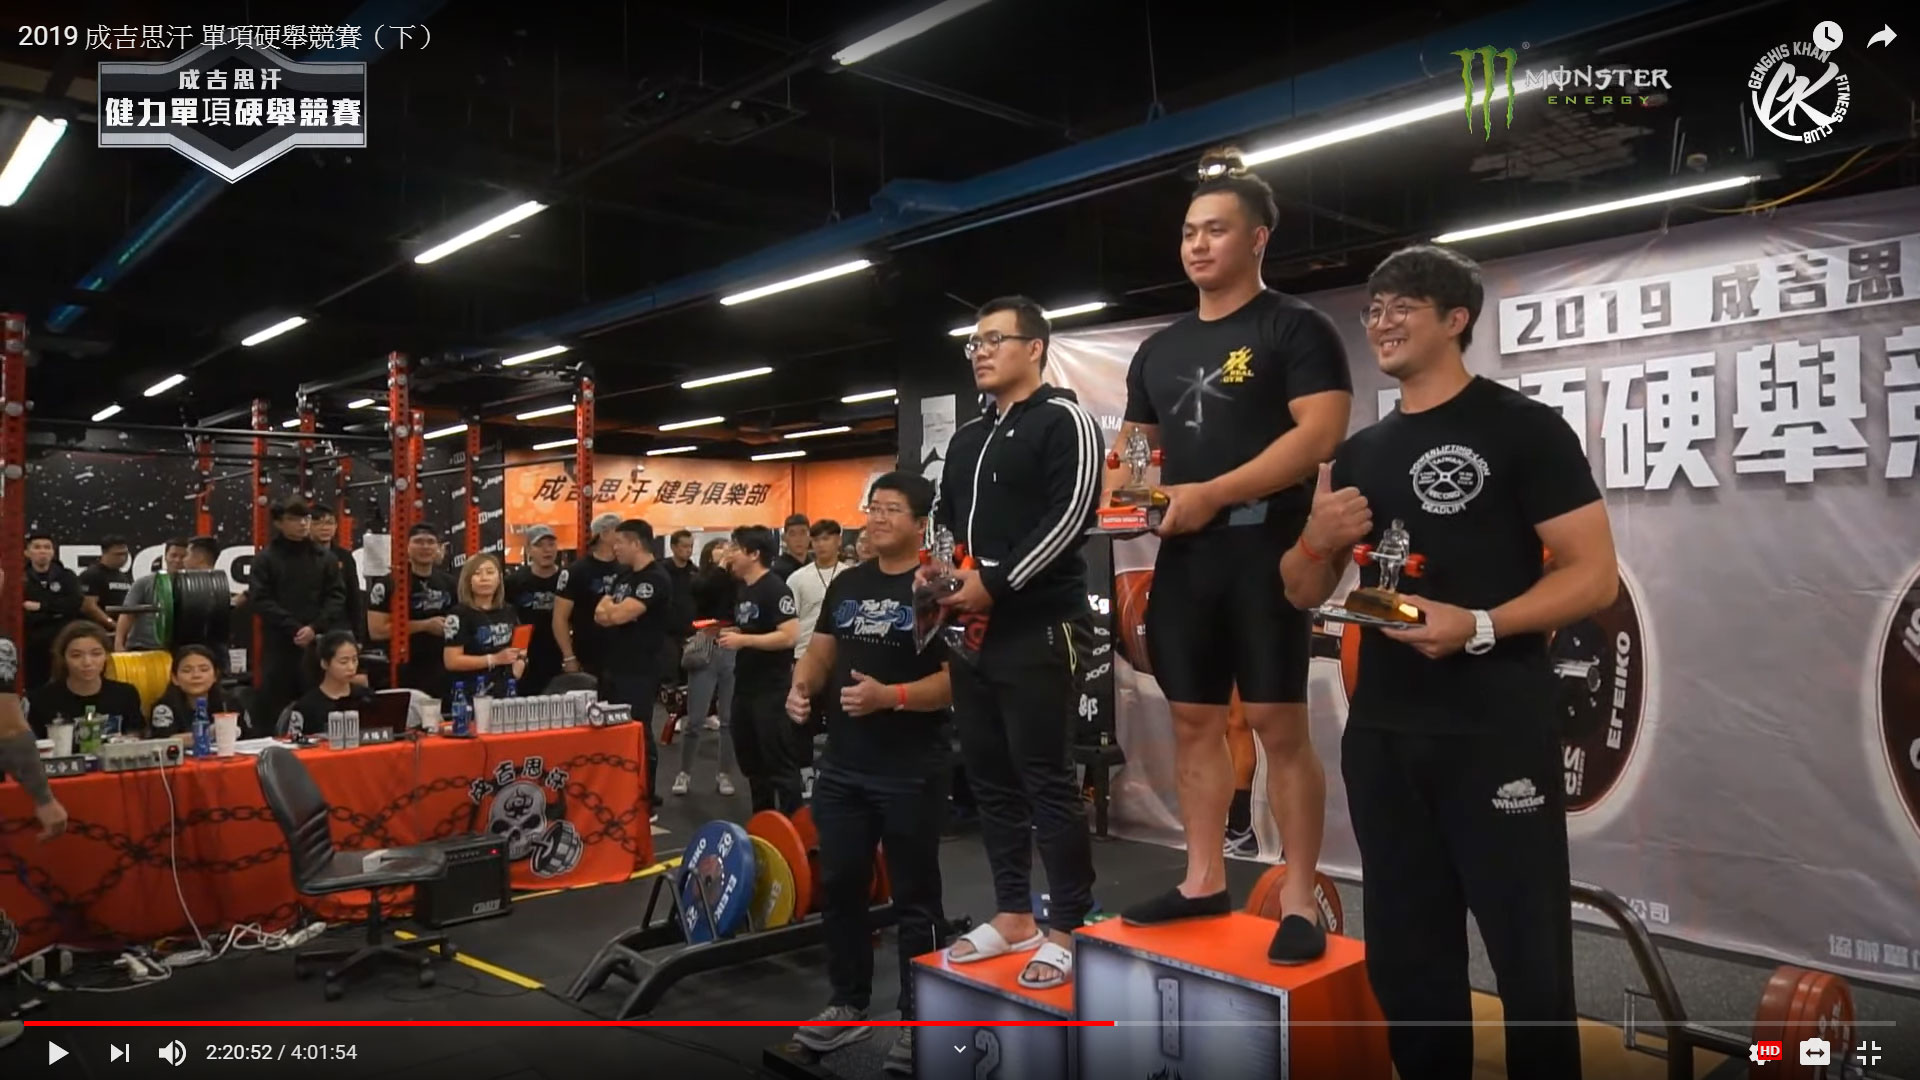 taipei-weightlifting-learn-2-2